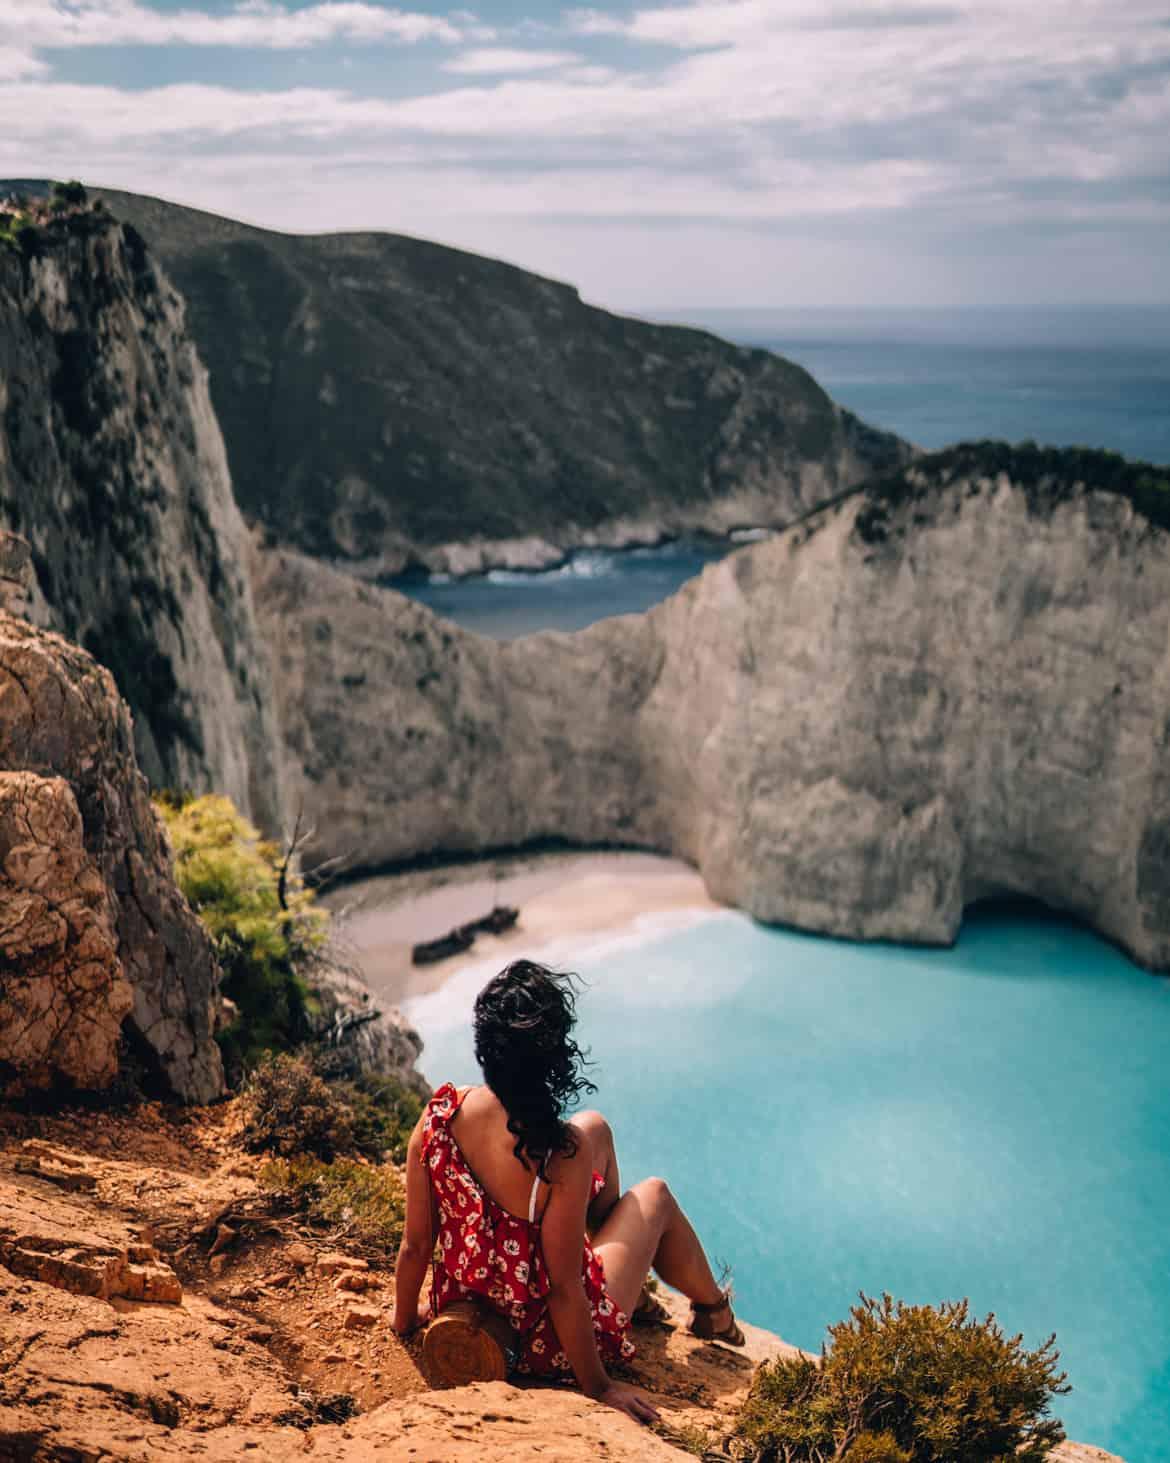 Zakynthos Urlaub - Navagio Bay / Shipwreck Beach Aussicht